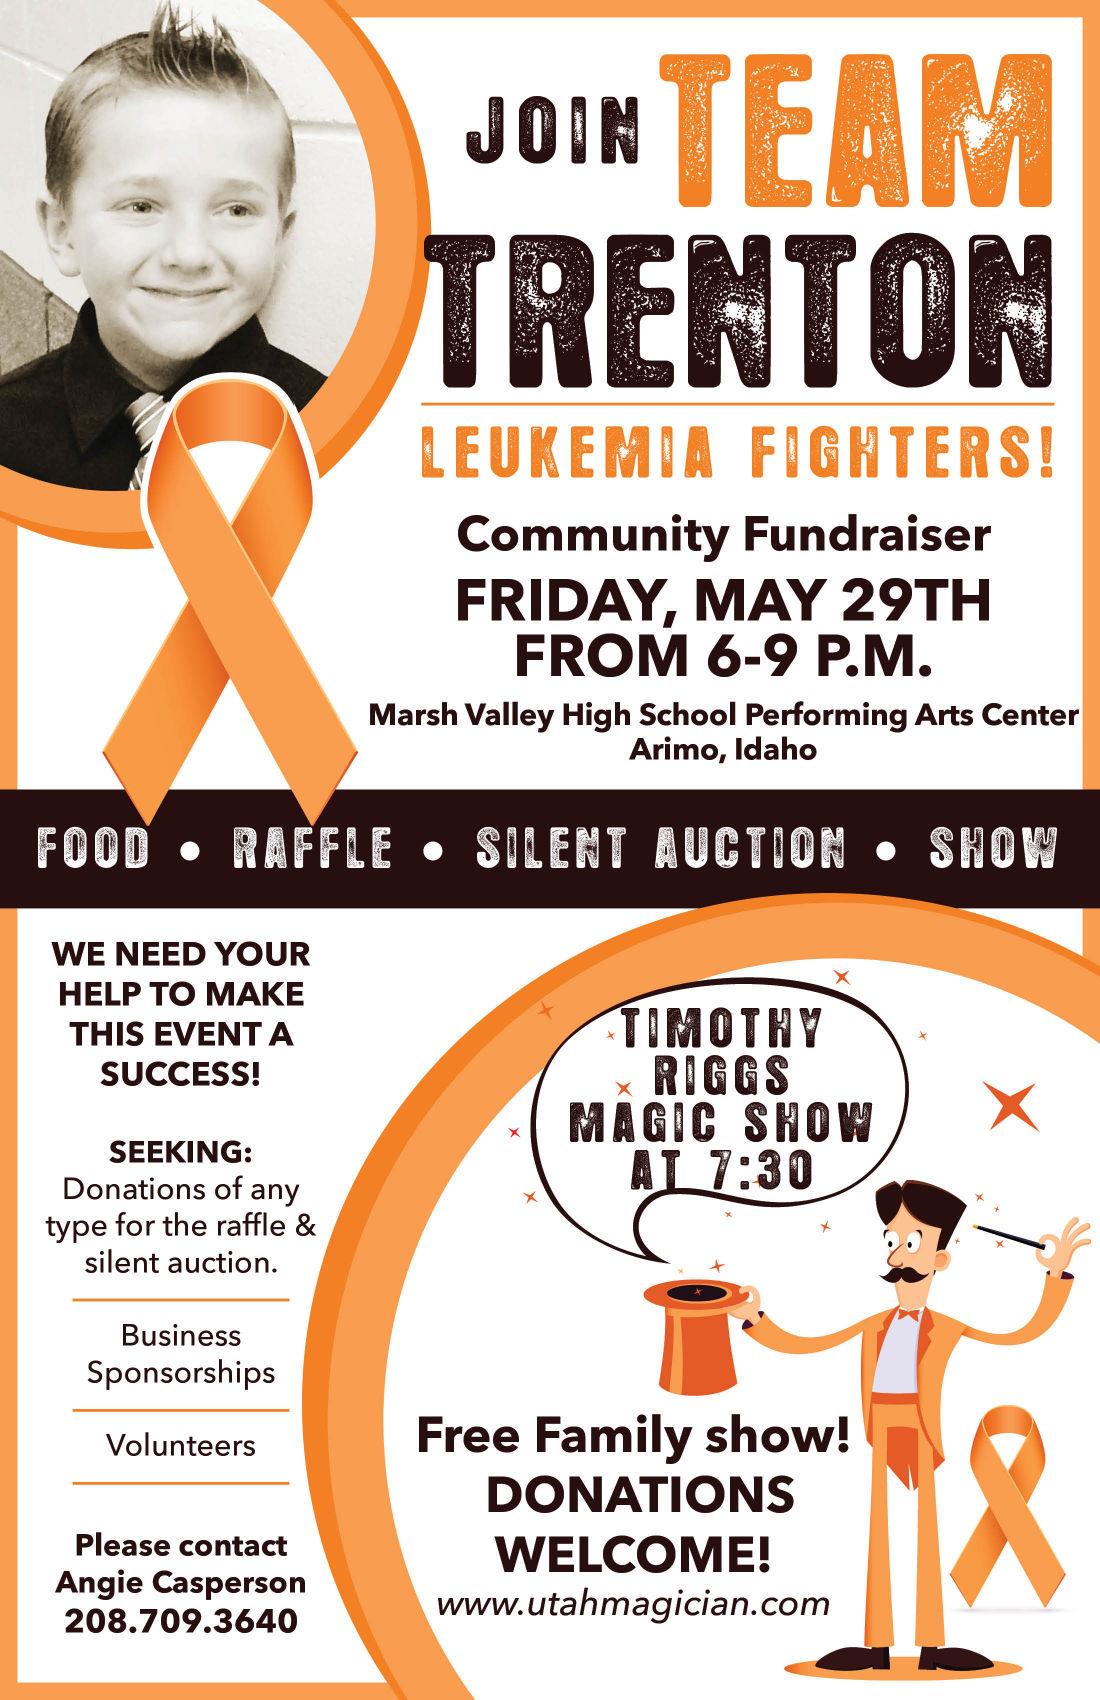 fundraiser set for inkom boy diagnosed with leukemia